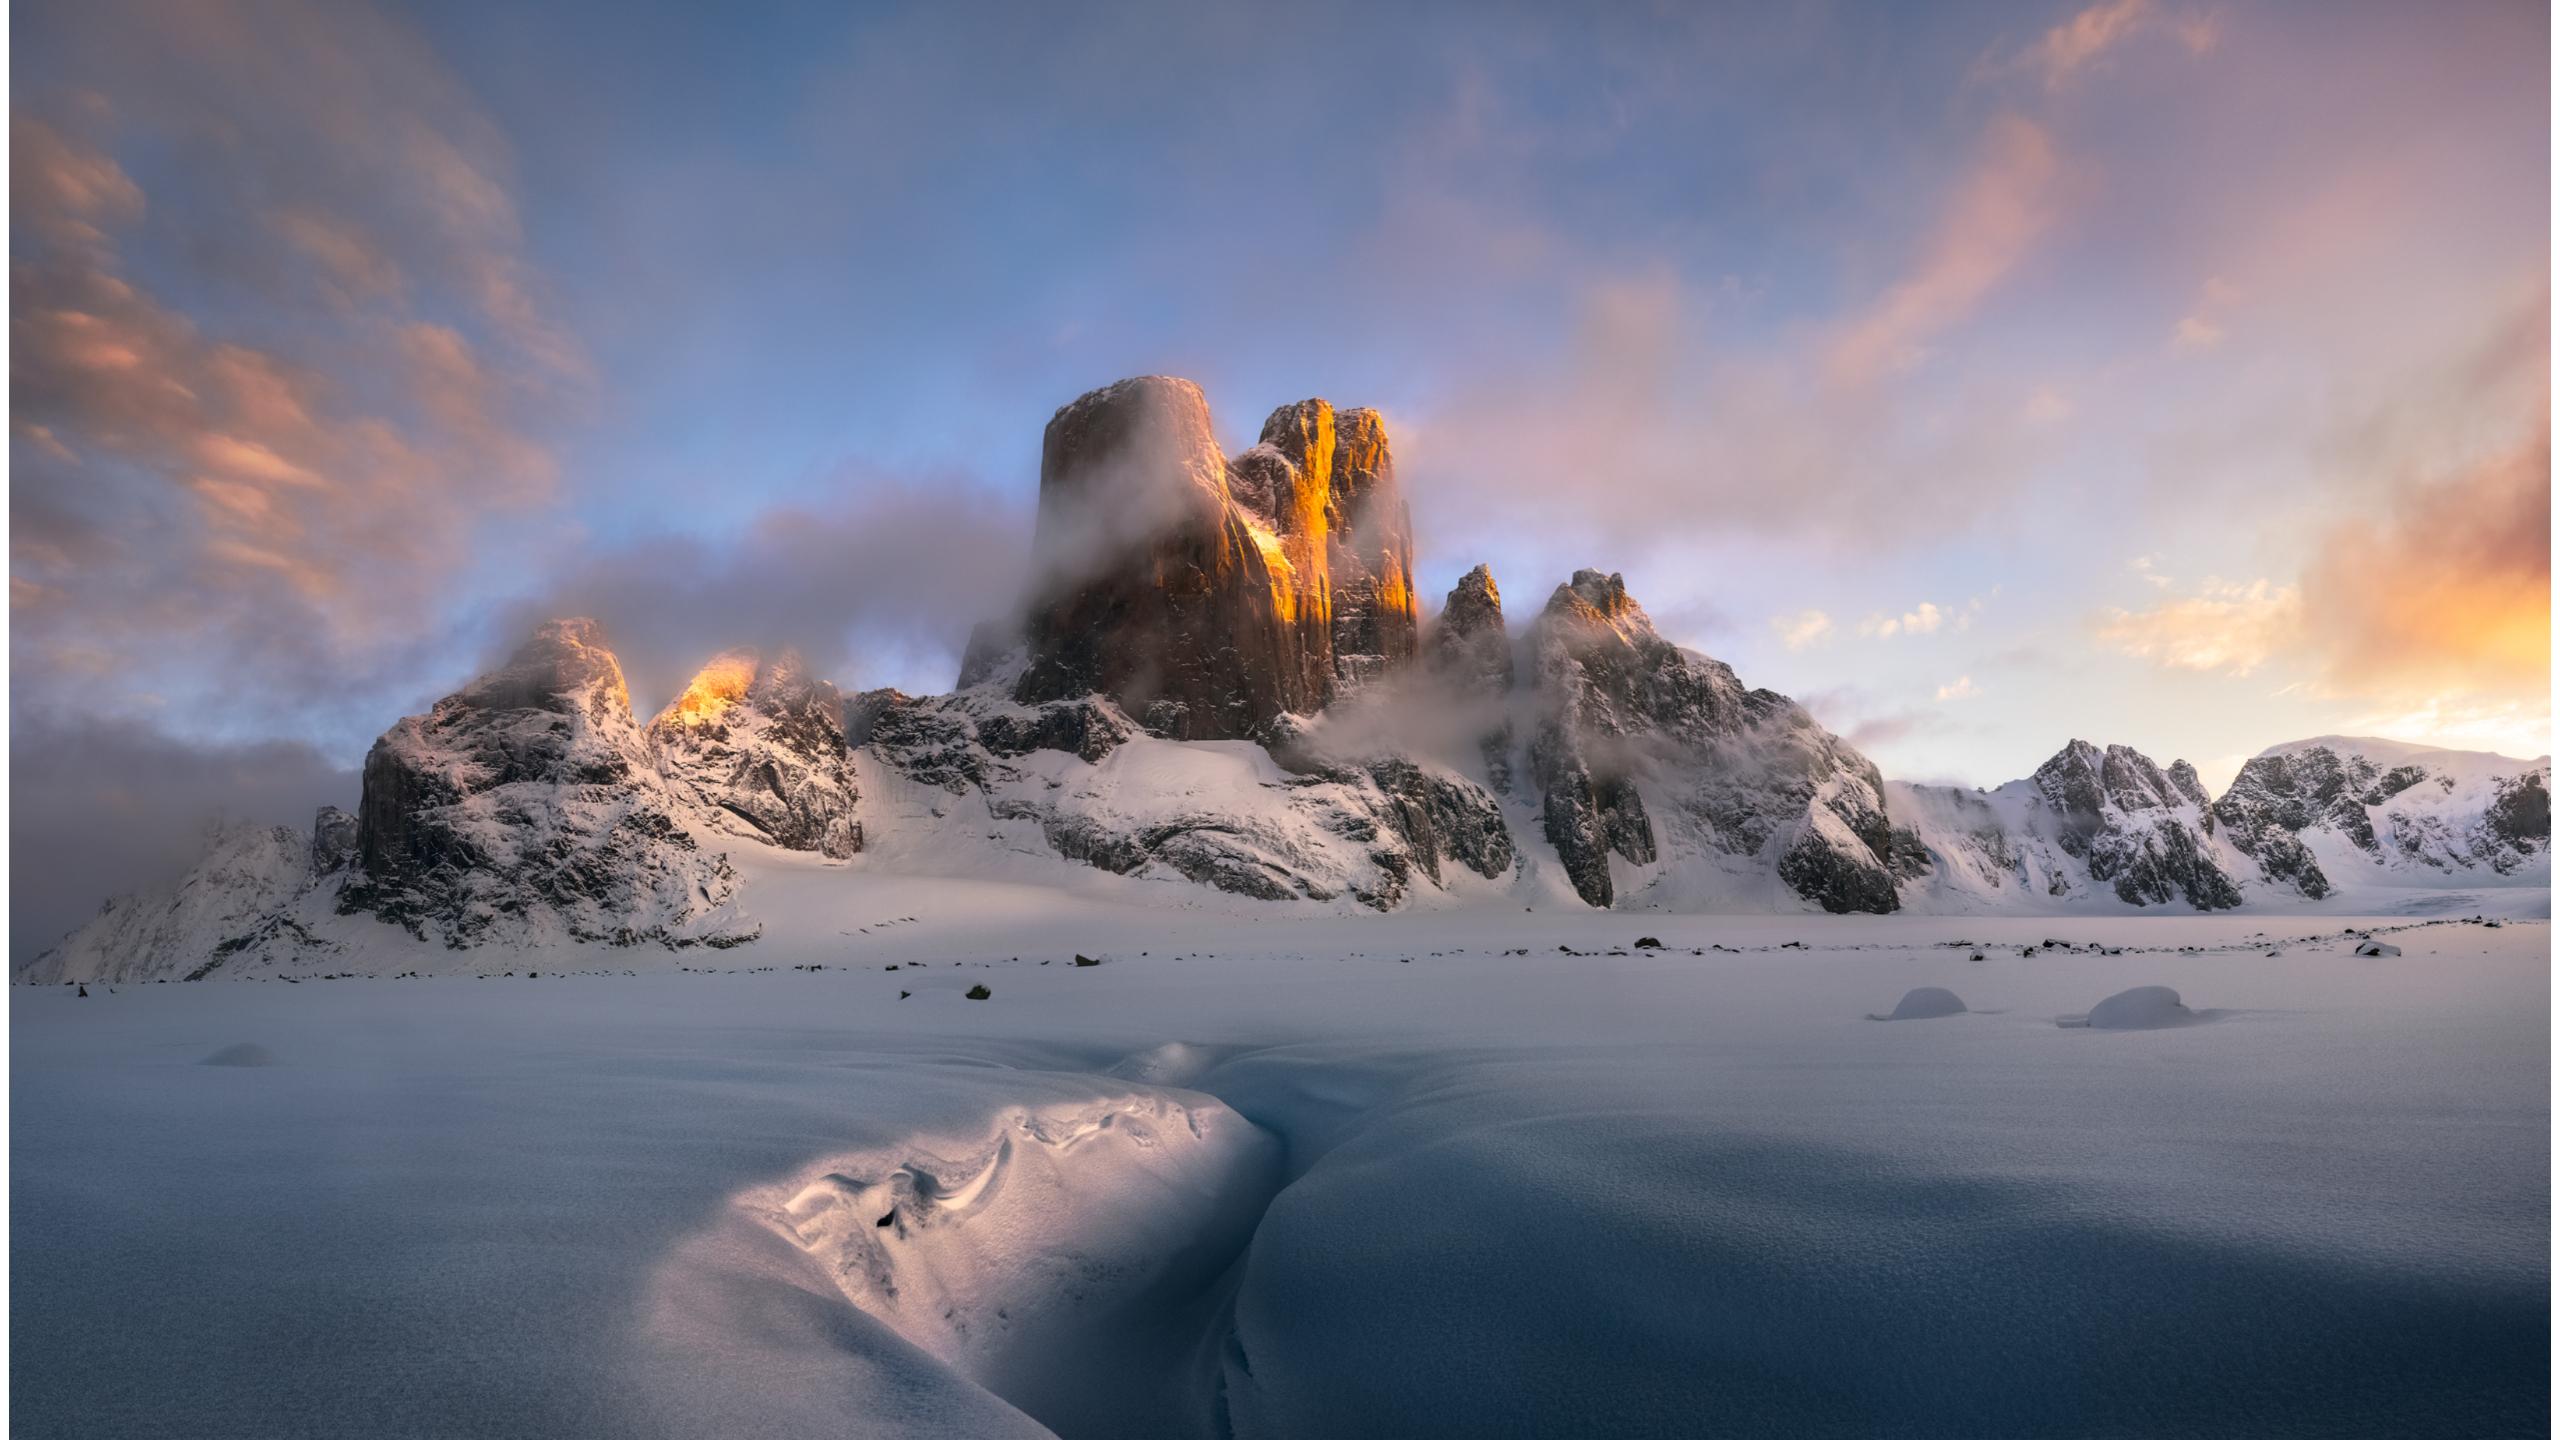 Nunavut: Kanada erhält neuen Territorial Park